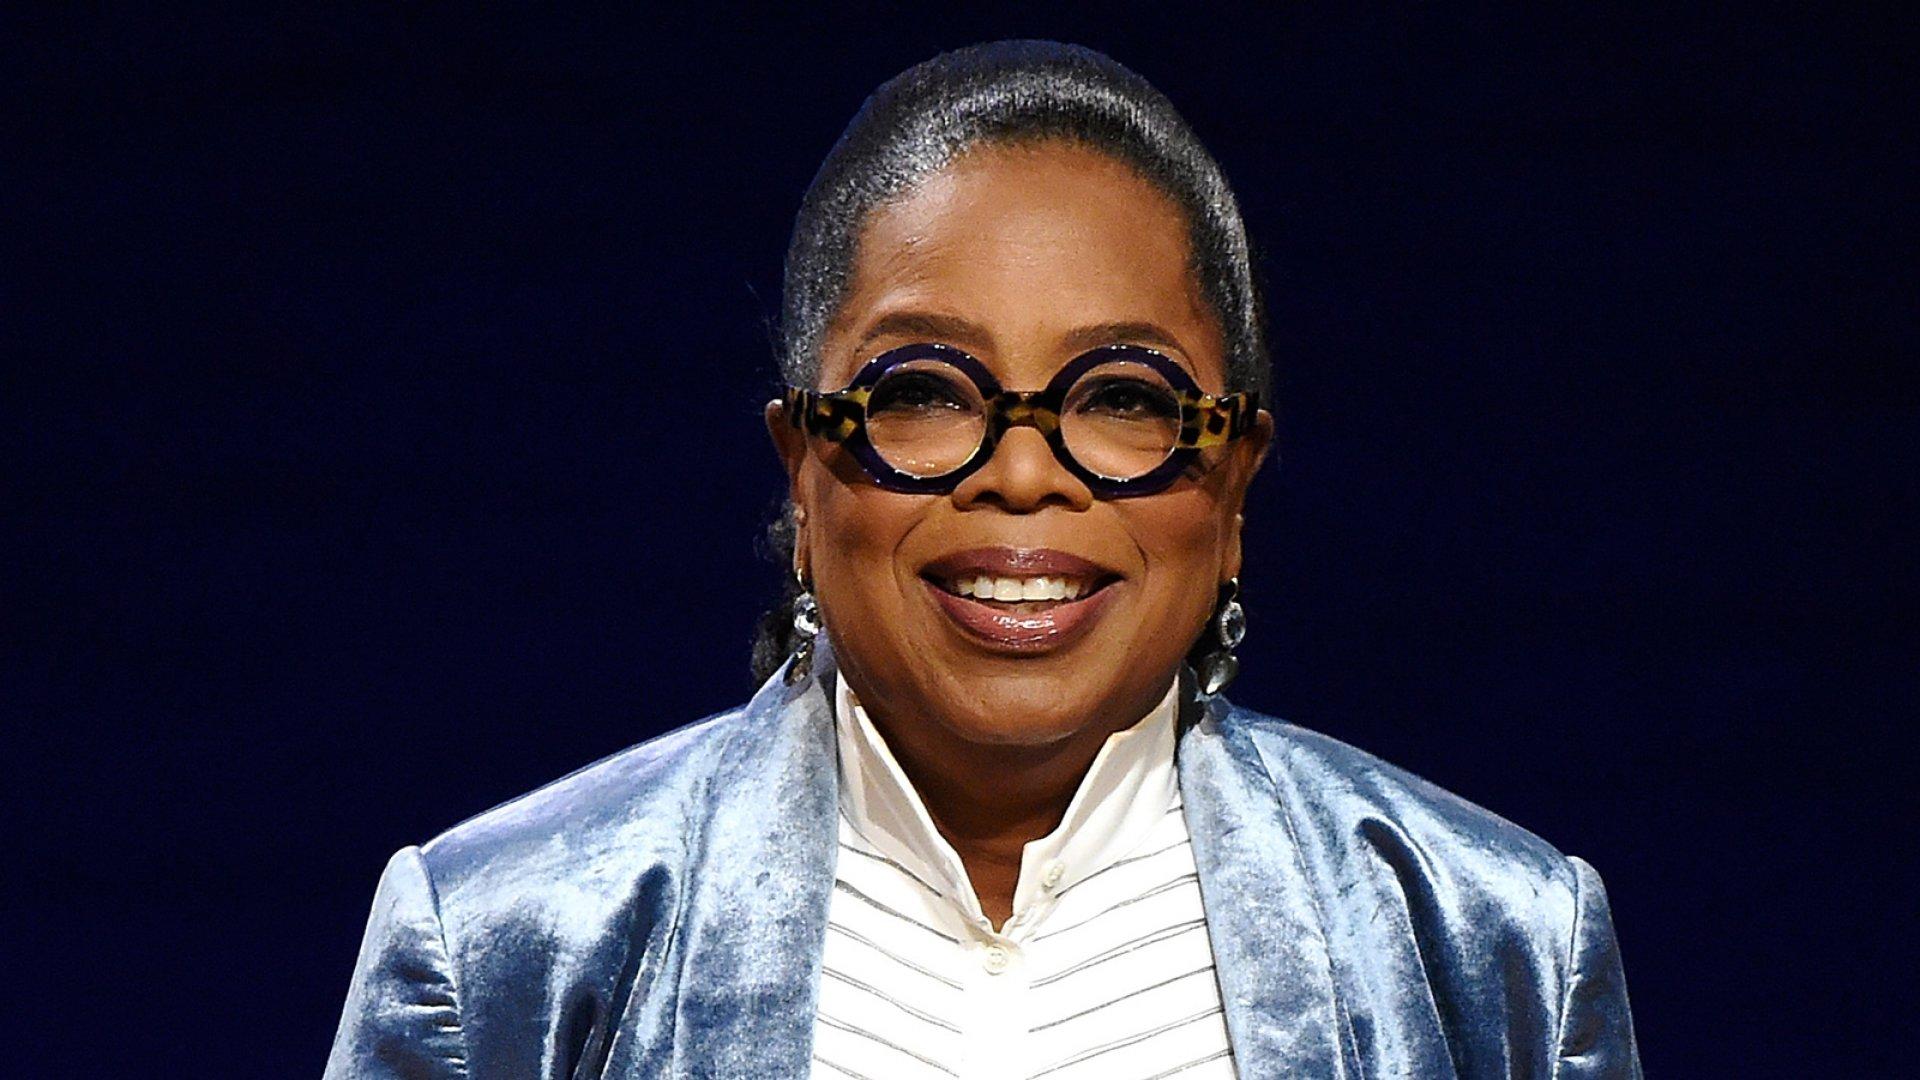 Why Superstars Like Oprah and Sheryl Sandberg Swear by Early Bedtimes